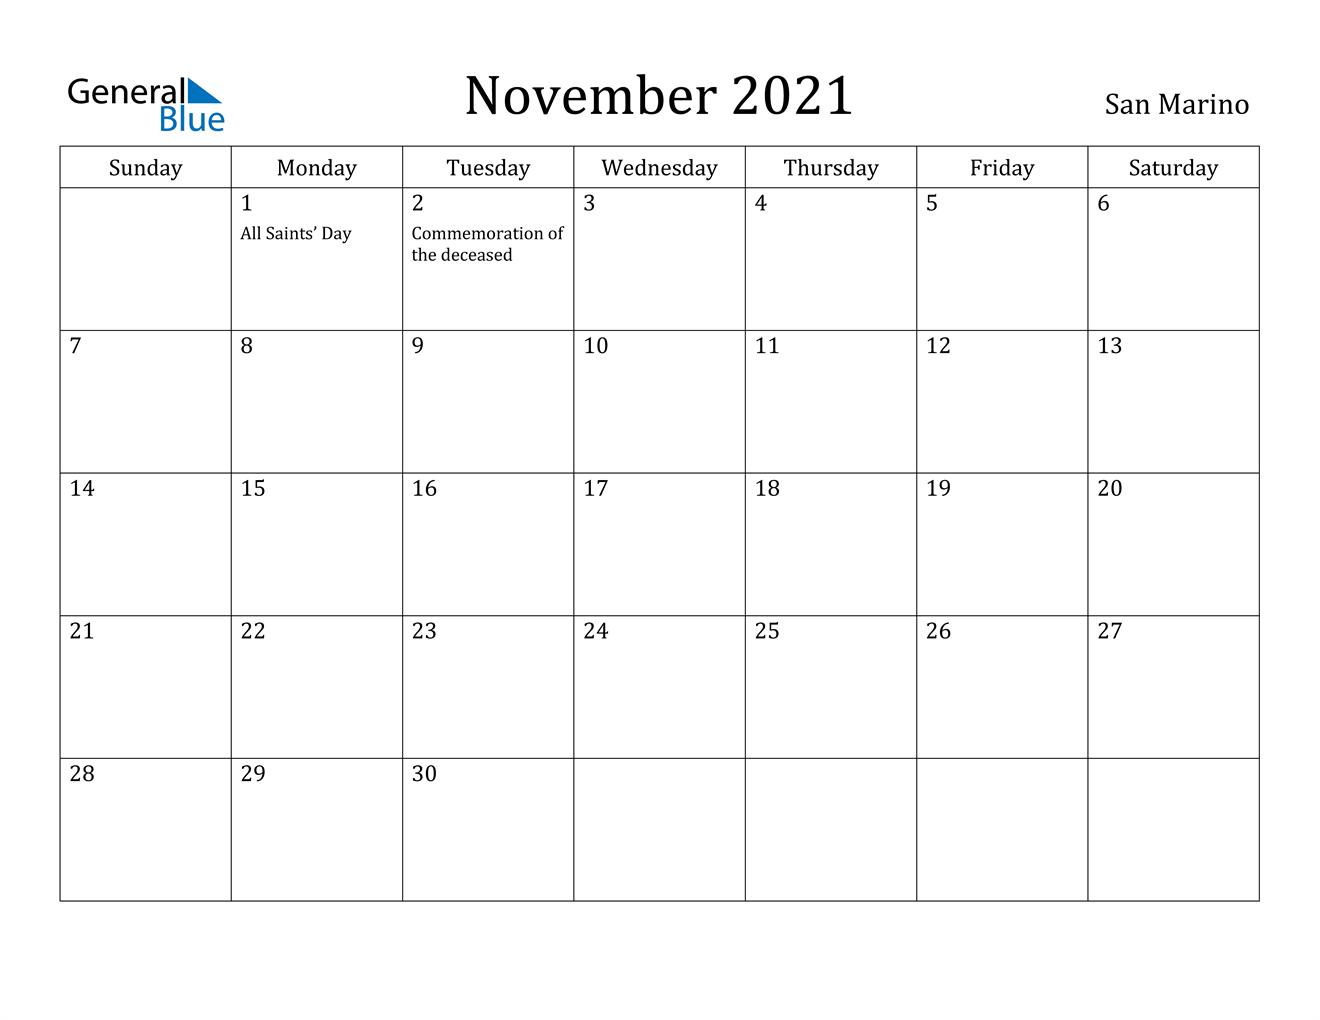 November 2021 Calendar - San Marino